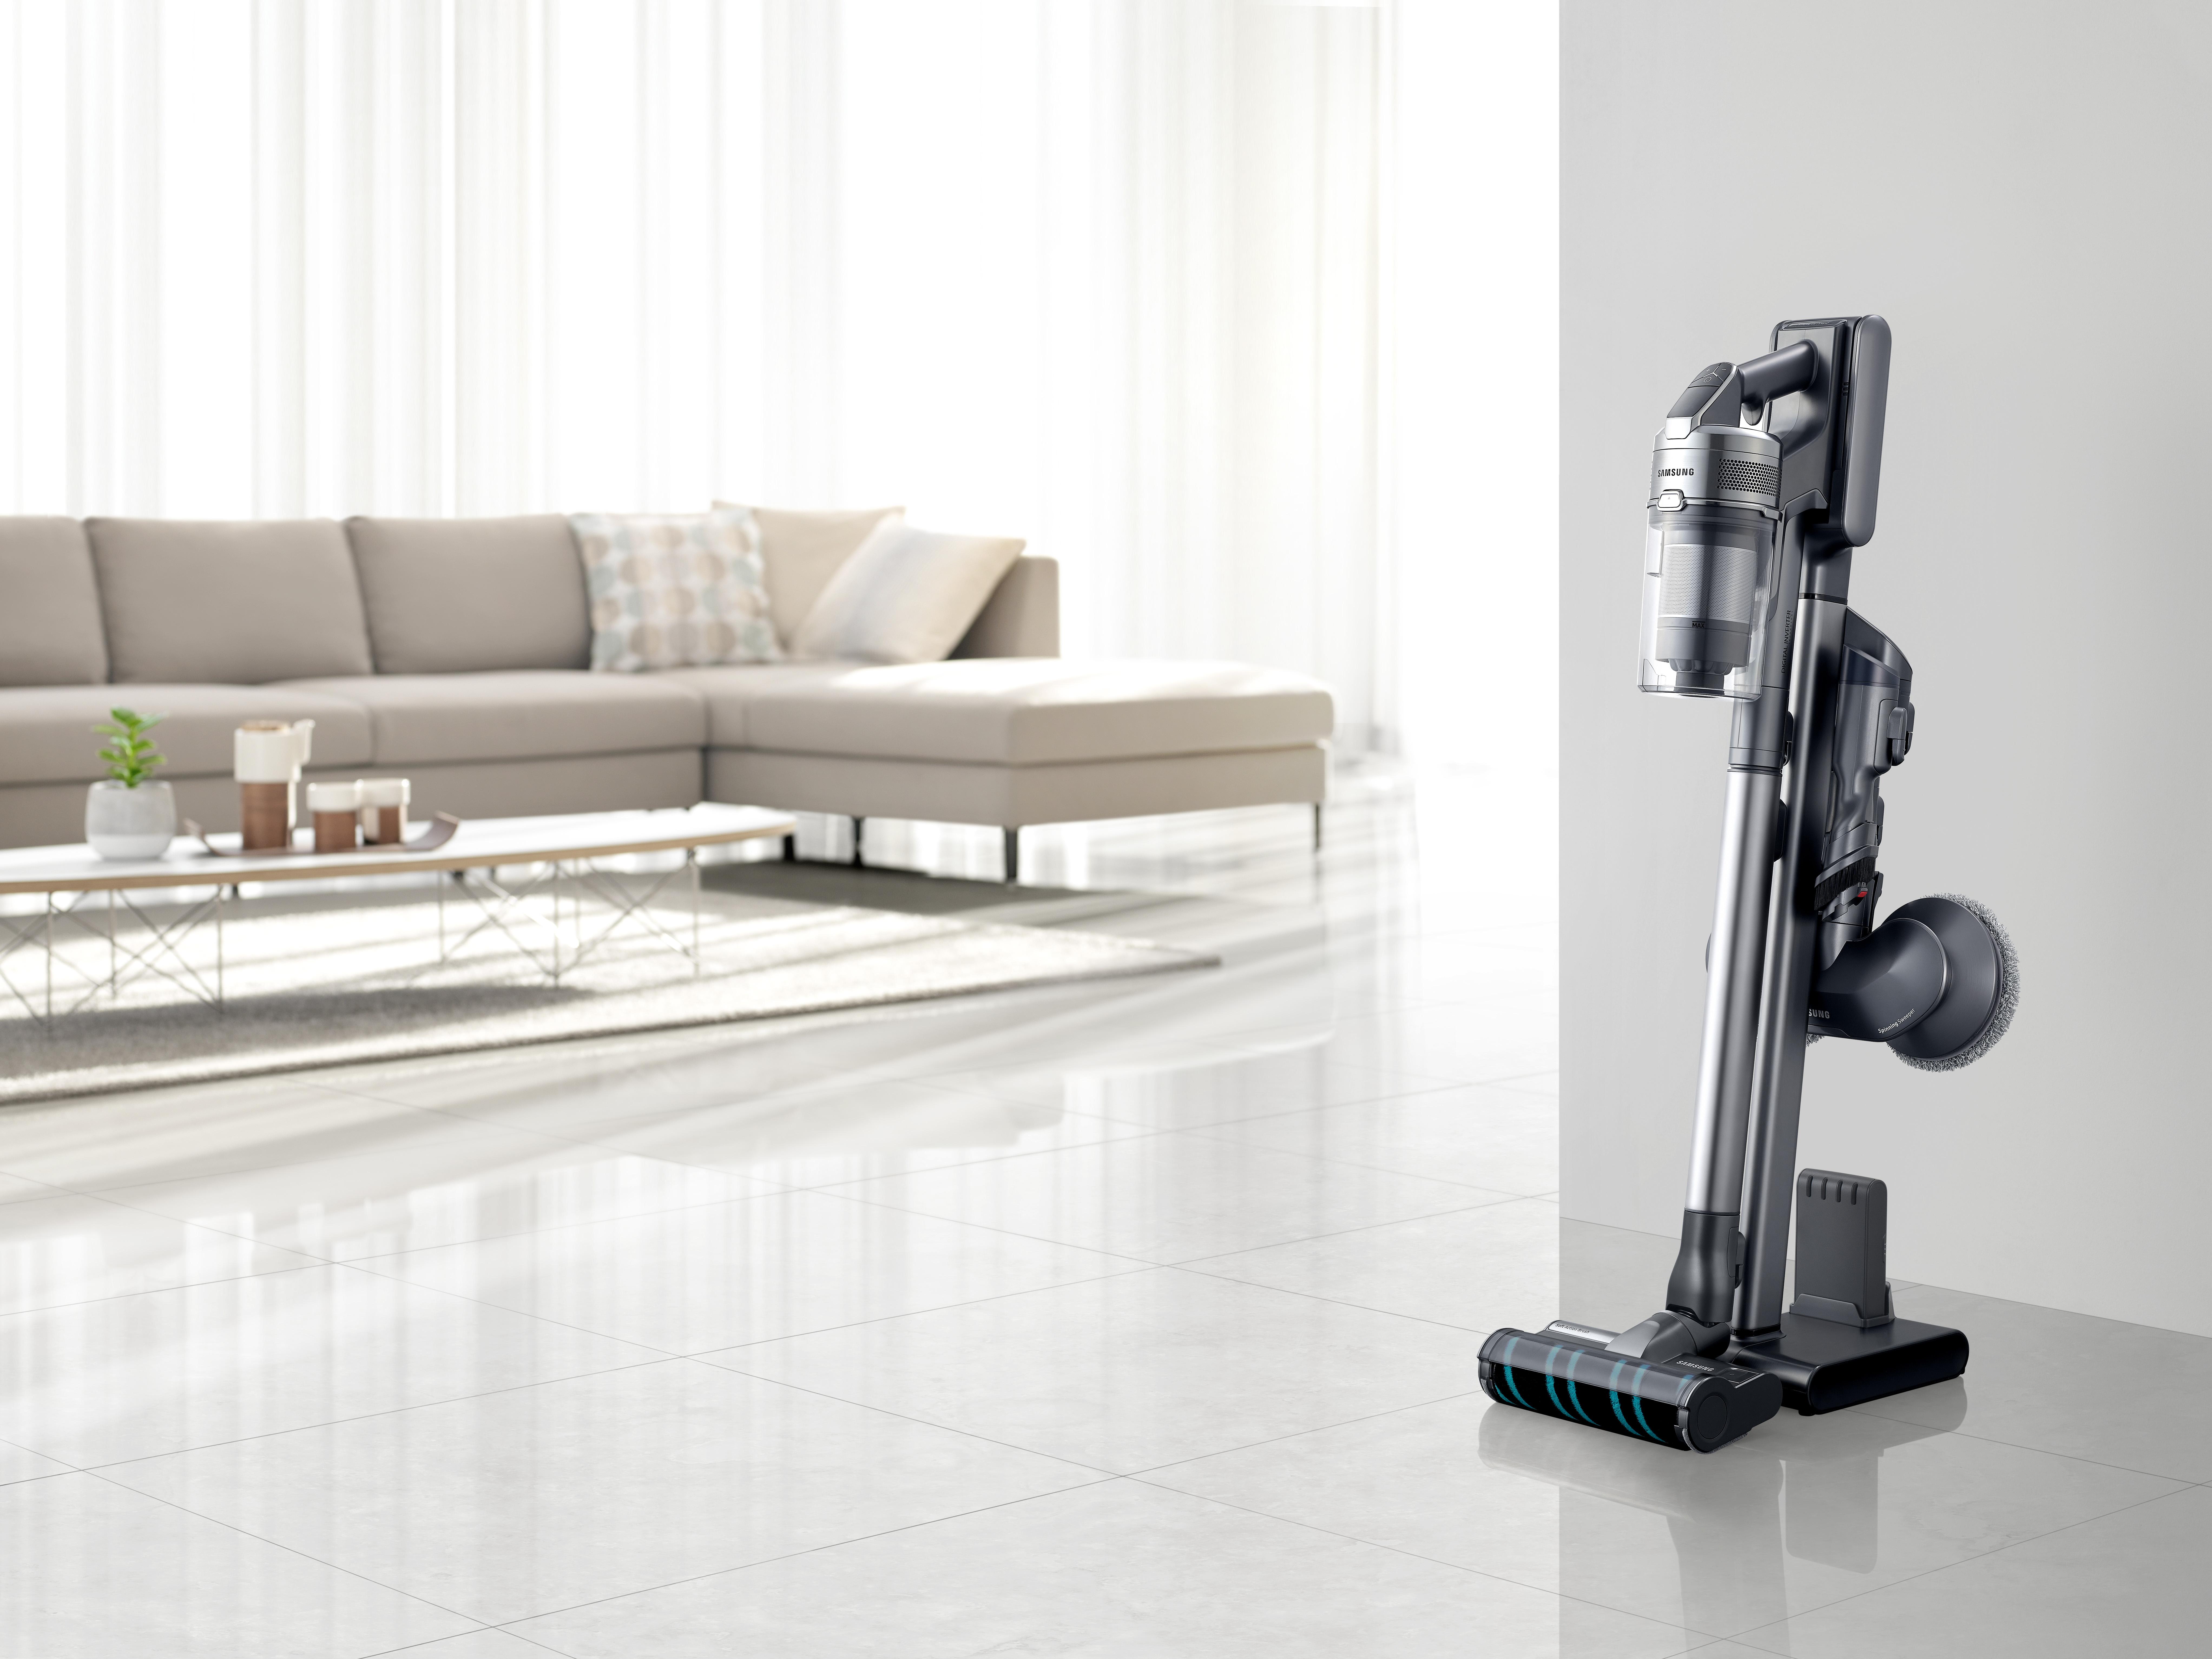 Samsung Jet™ Stick Vacuum